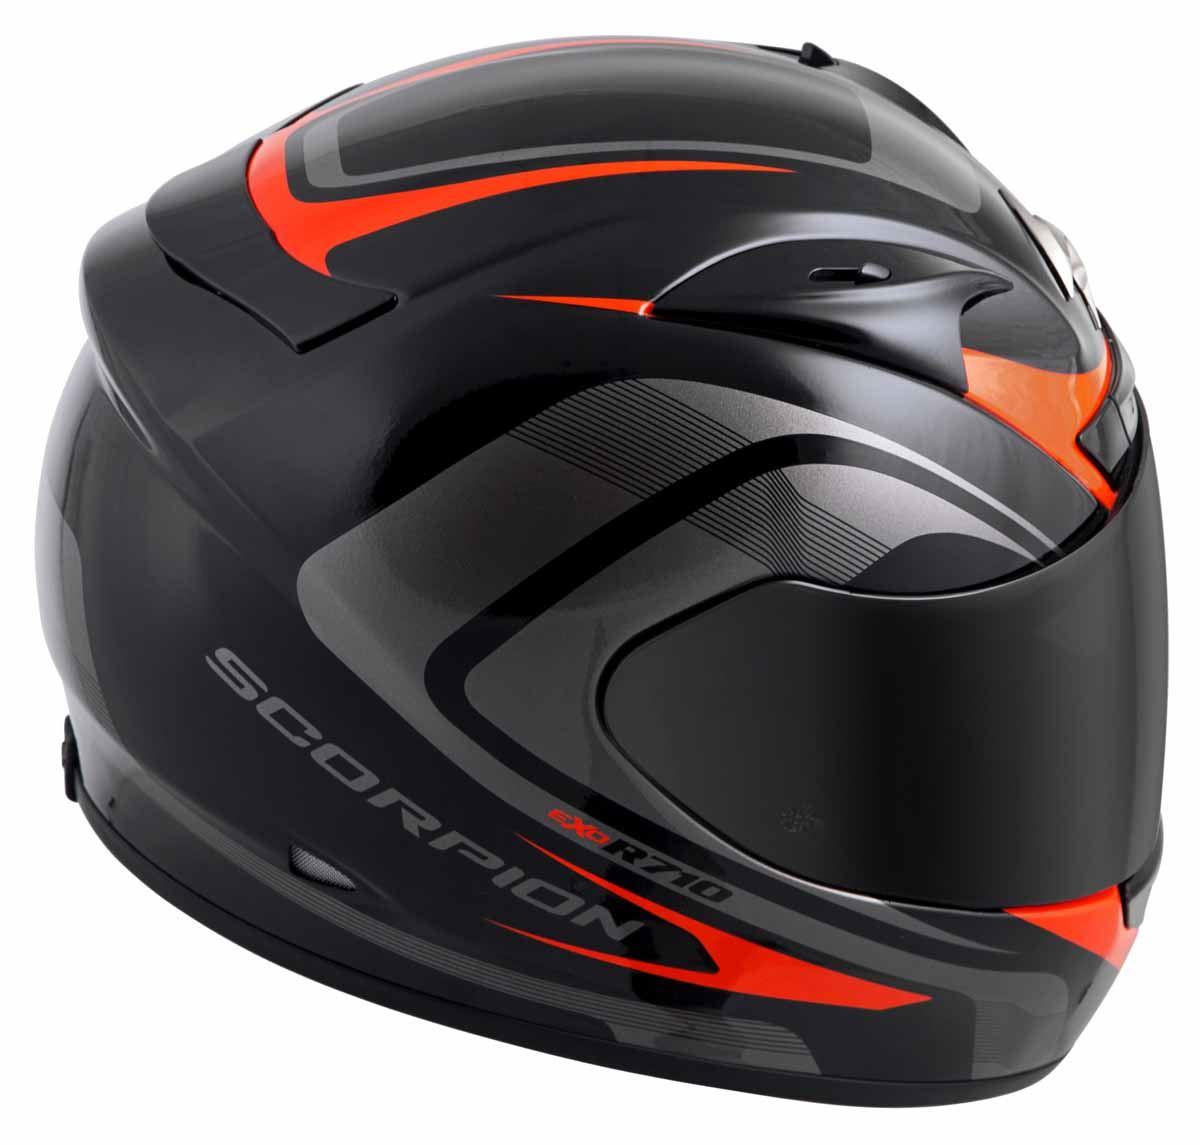 Scorpion-EXO-R710-Helmet-Fiberglass-Full-Face-DOT-SNELL-M2015-Certified-XS-2XL miniature 14